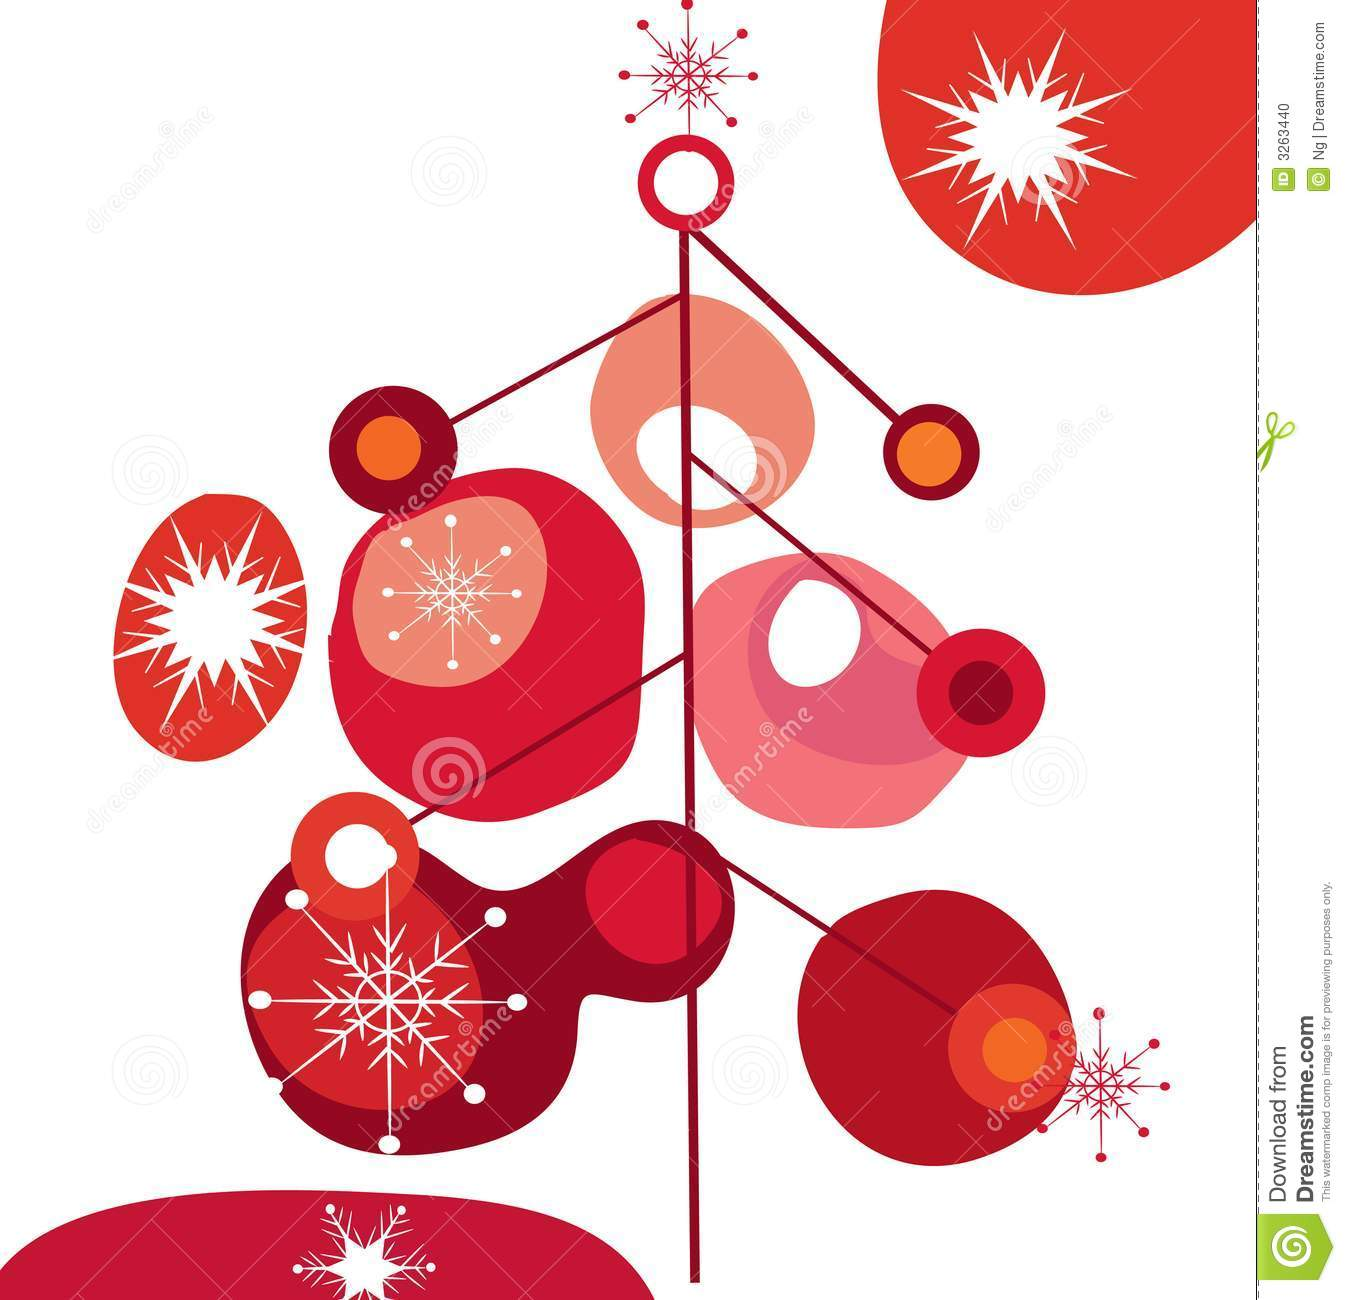 Funky christmas tree stock illustration. Illustration of background.